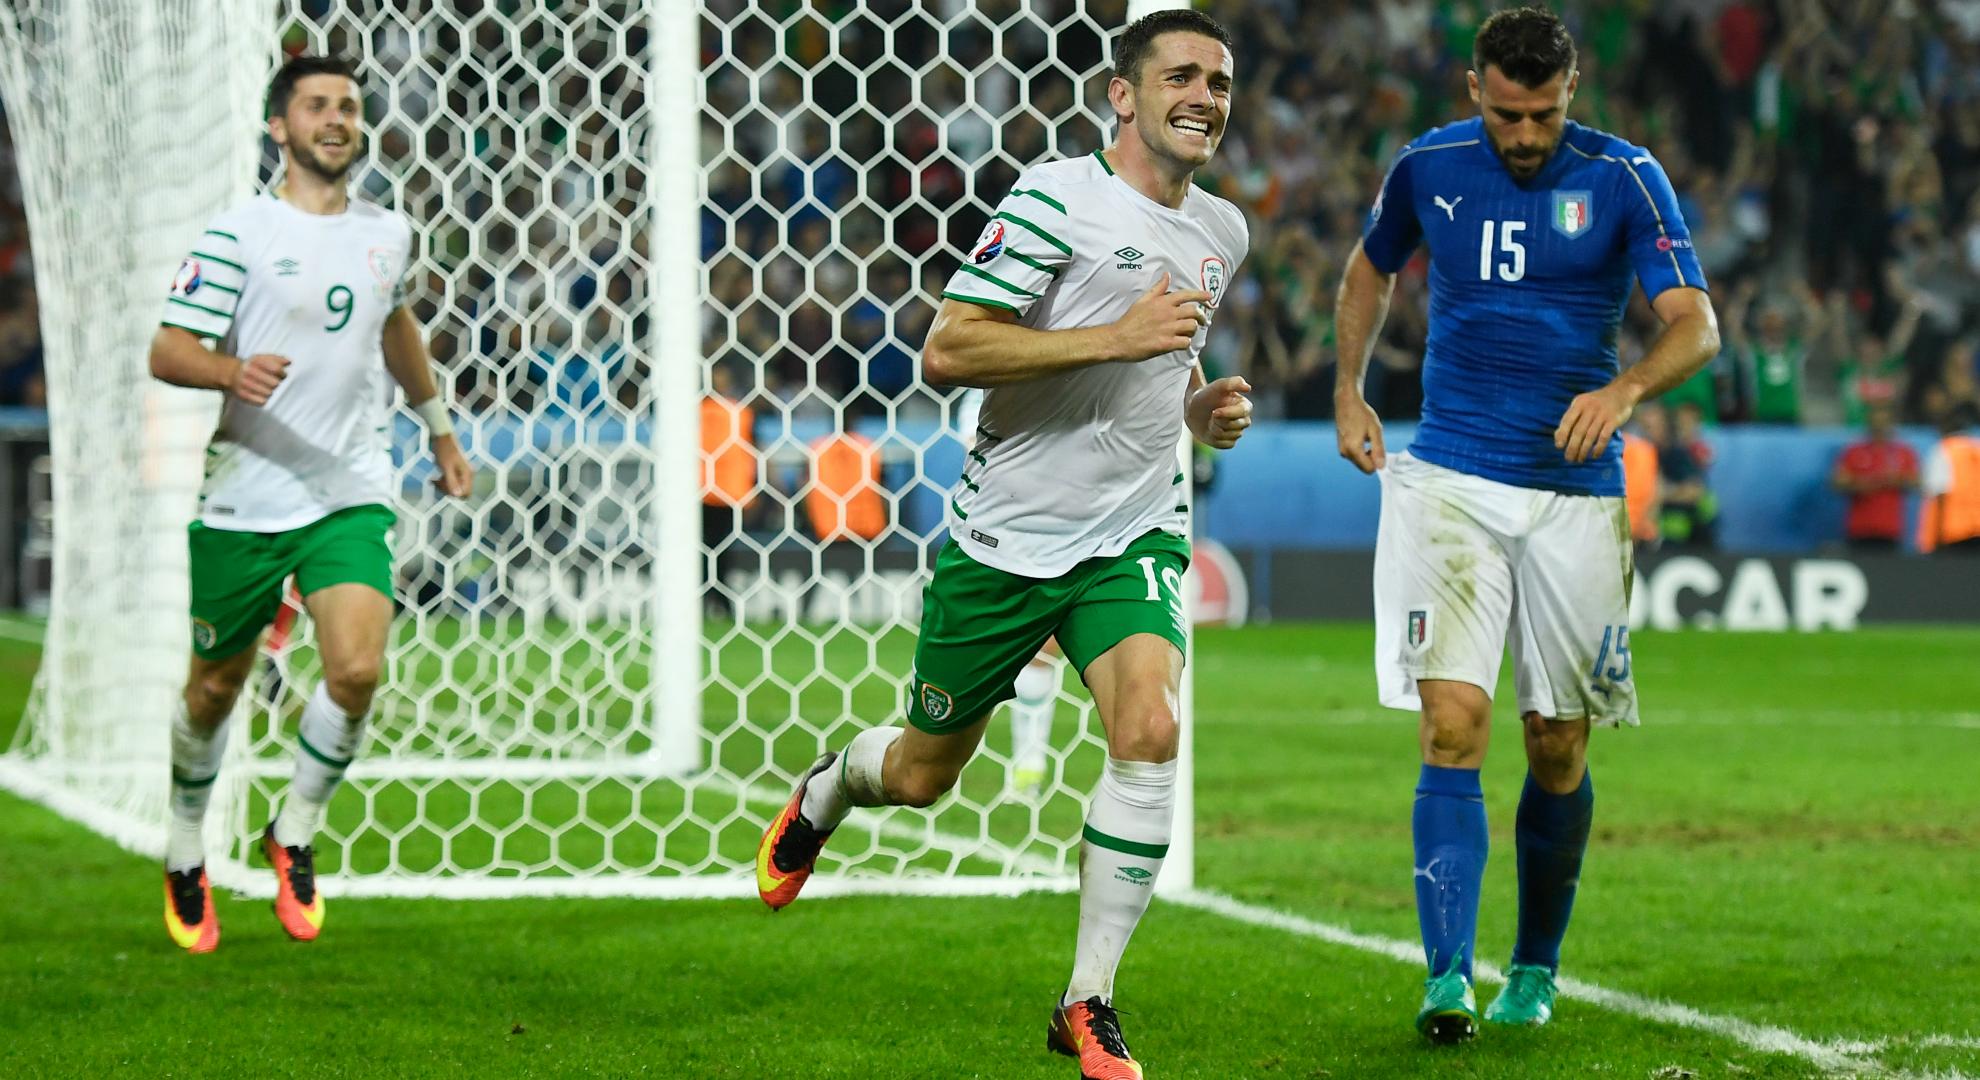 Francia-Irlanda 2-1 Video Gol Highlights Europei 26 giugno 2016